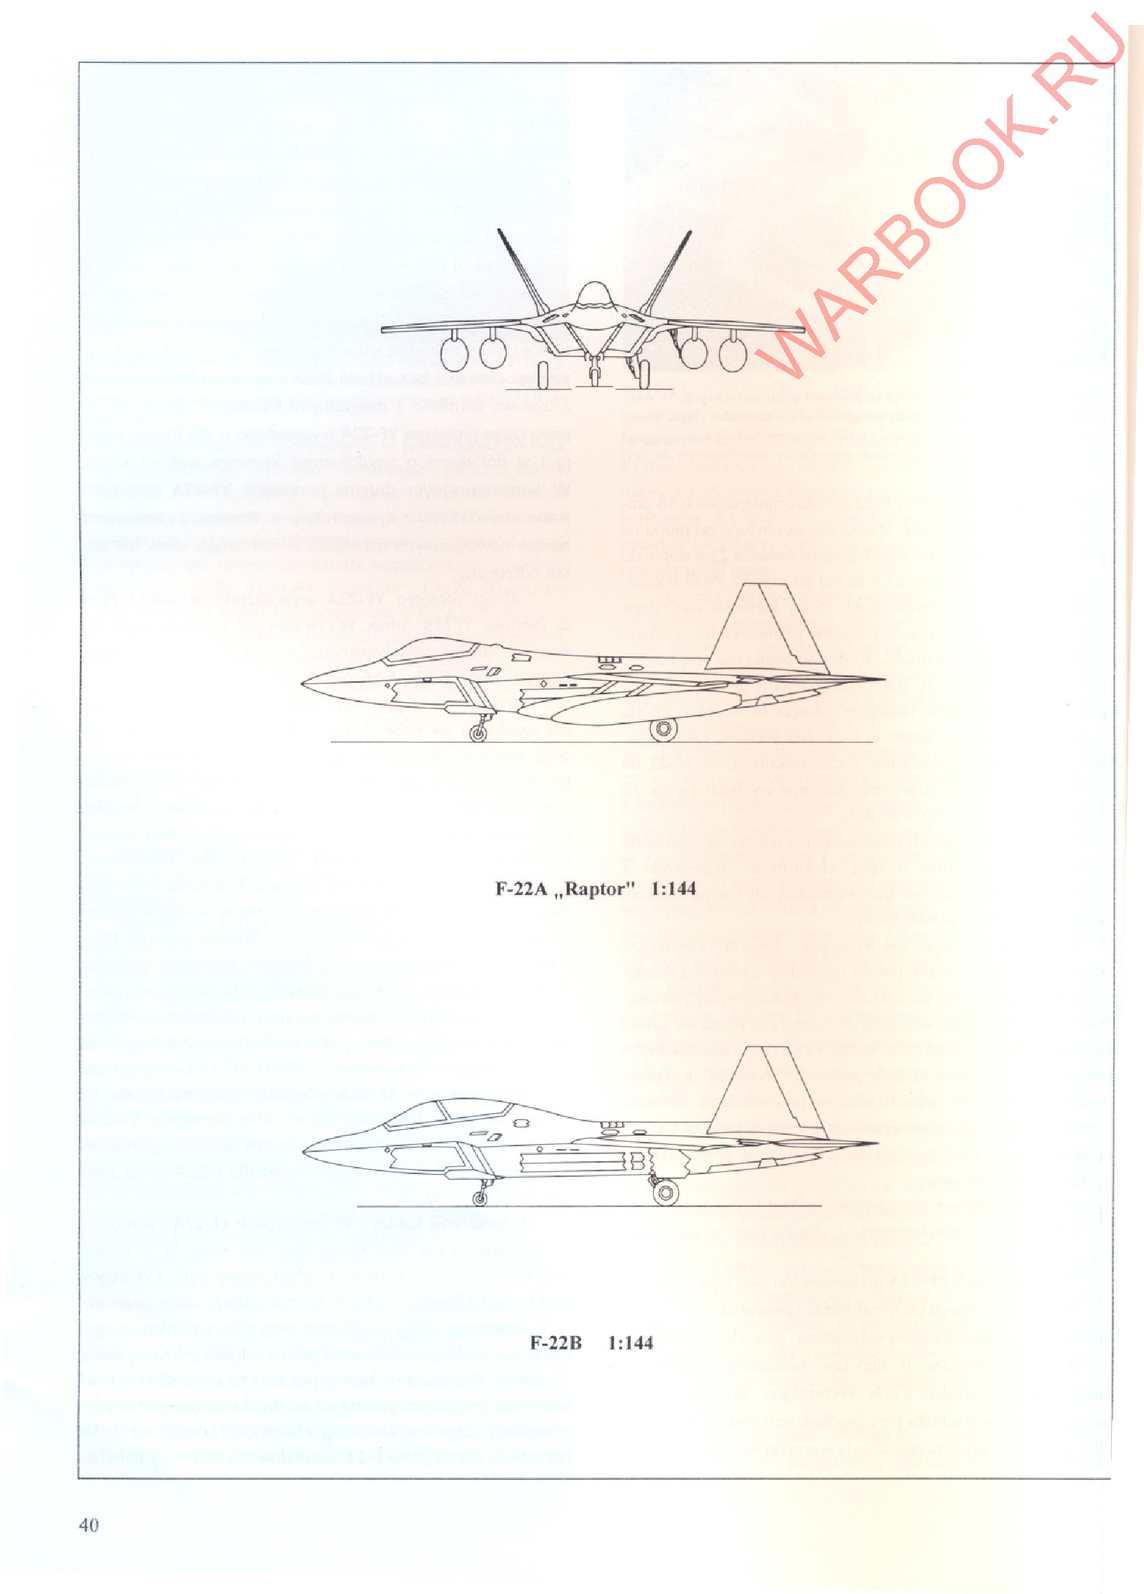 Wydawnictwo Militaria 48 F-22 Raptor - CALAMEO Downloader